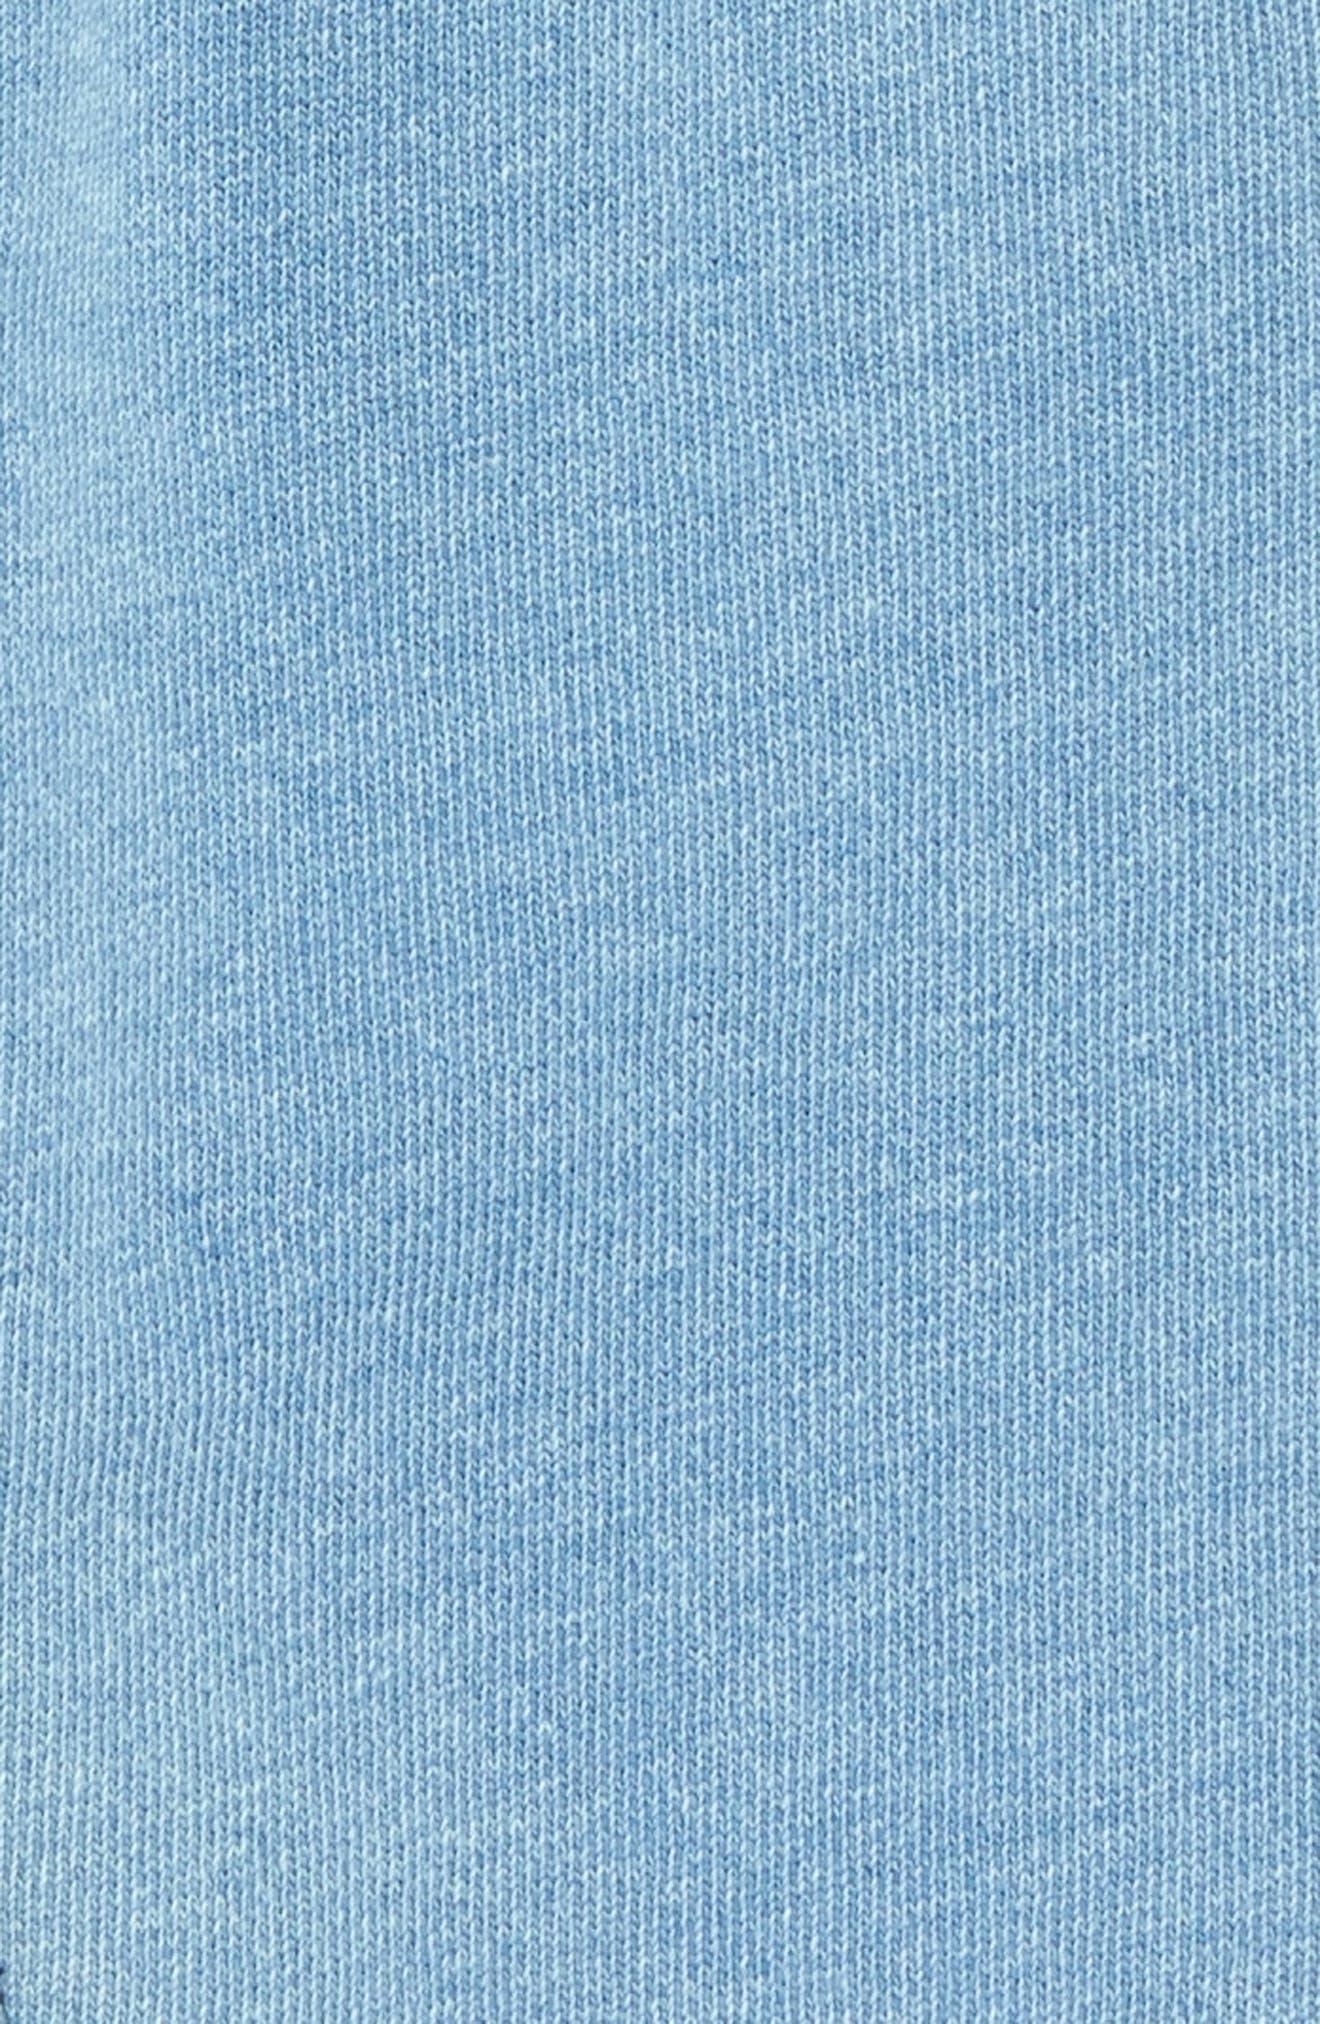 Knit Denim Pants,                             Alternate thumbnail 2, color,                             Blue Indigo